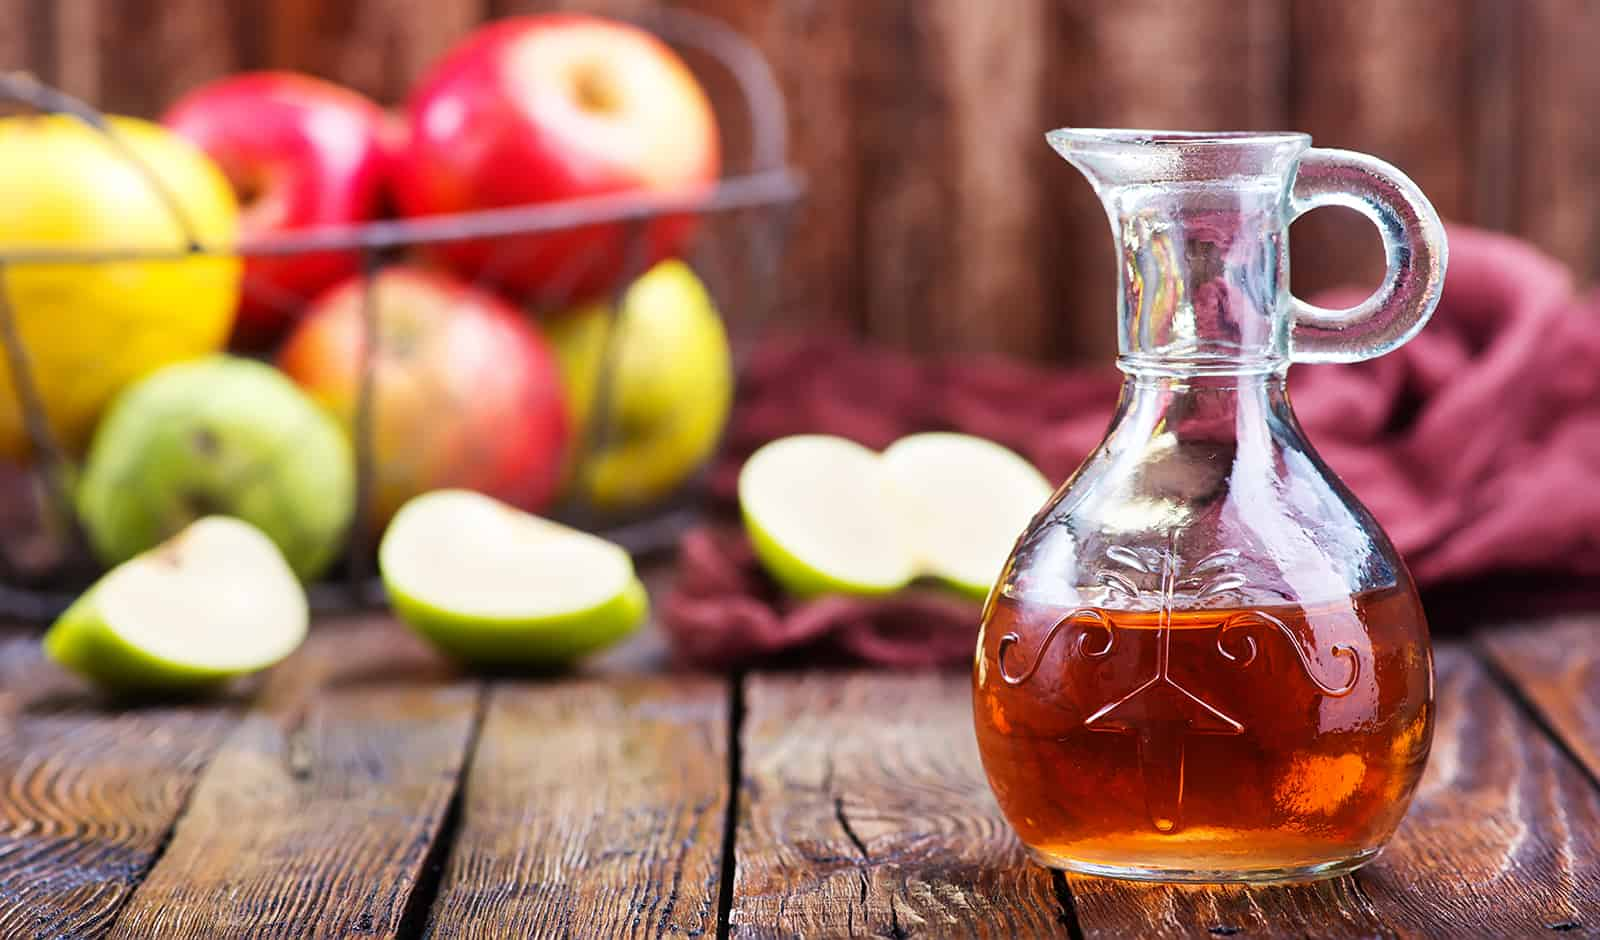 best-ways-to-use-vinegar-main-image